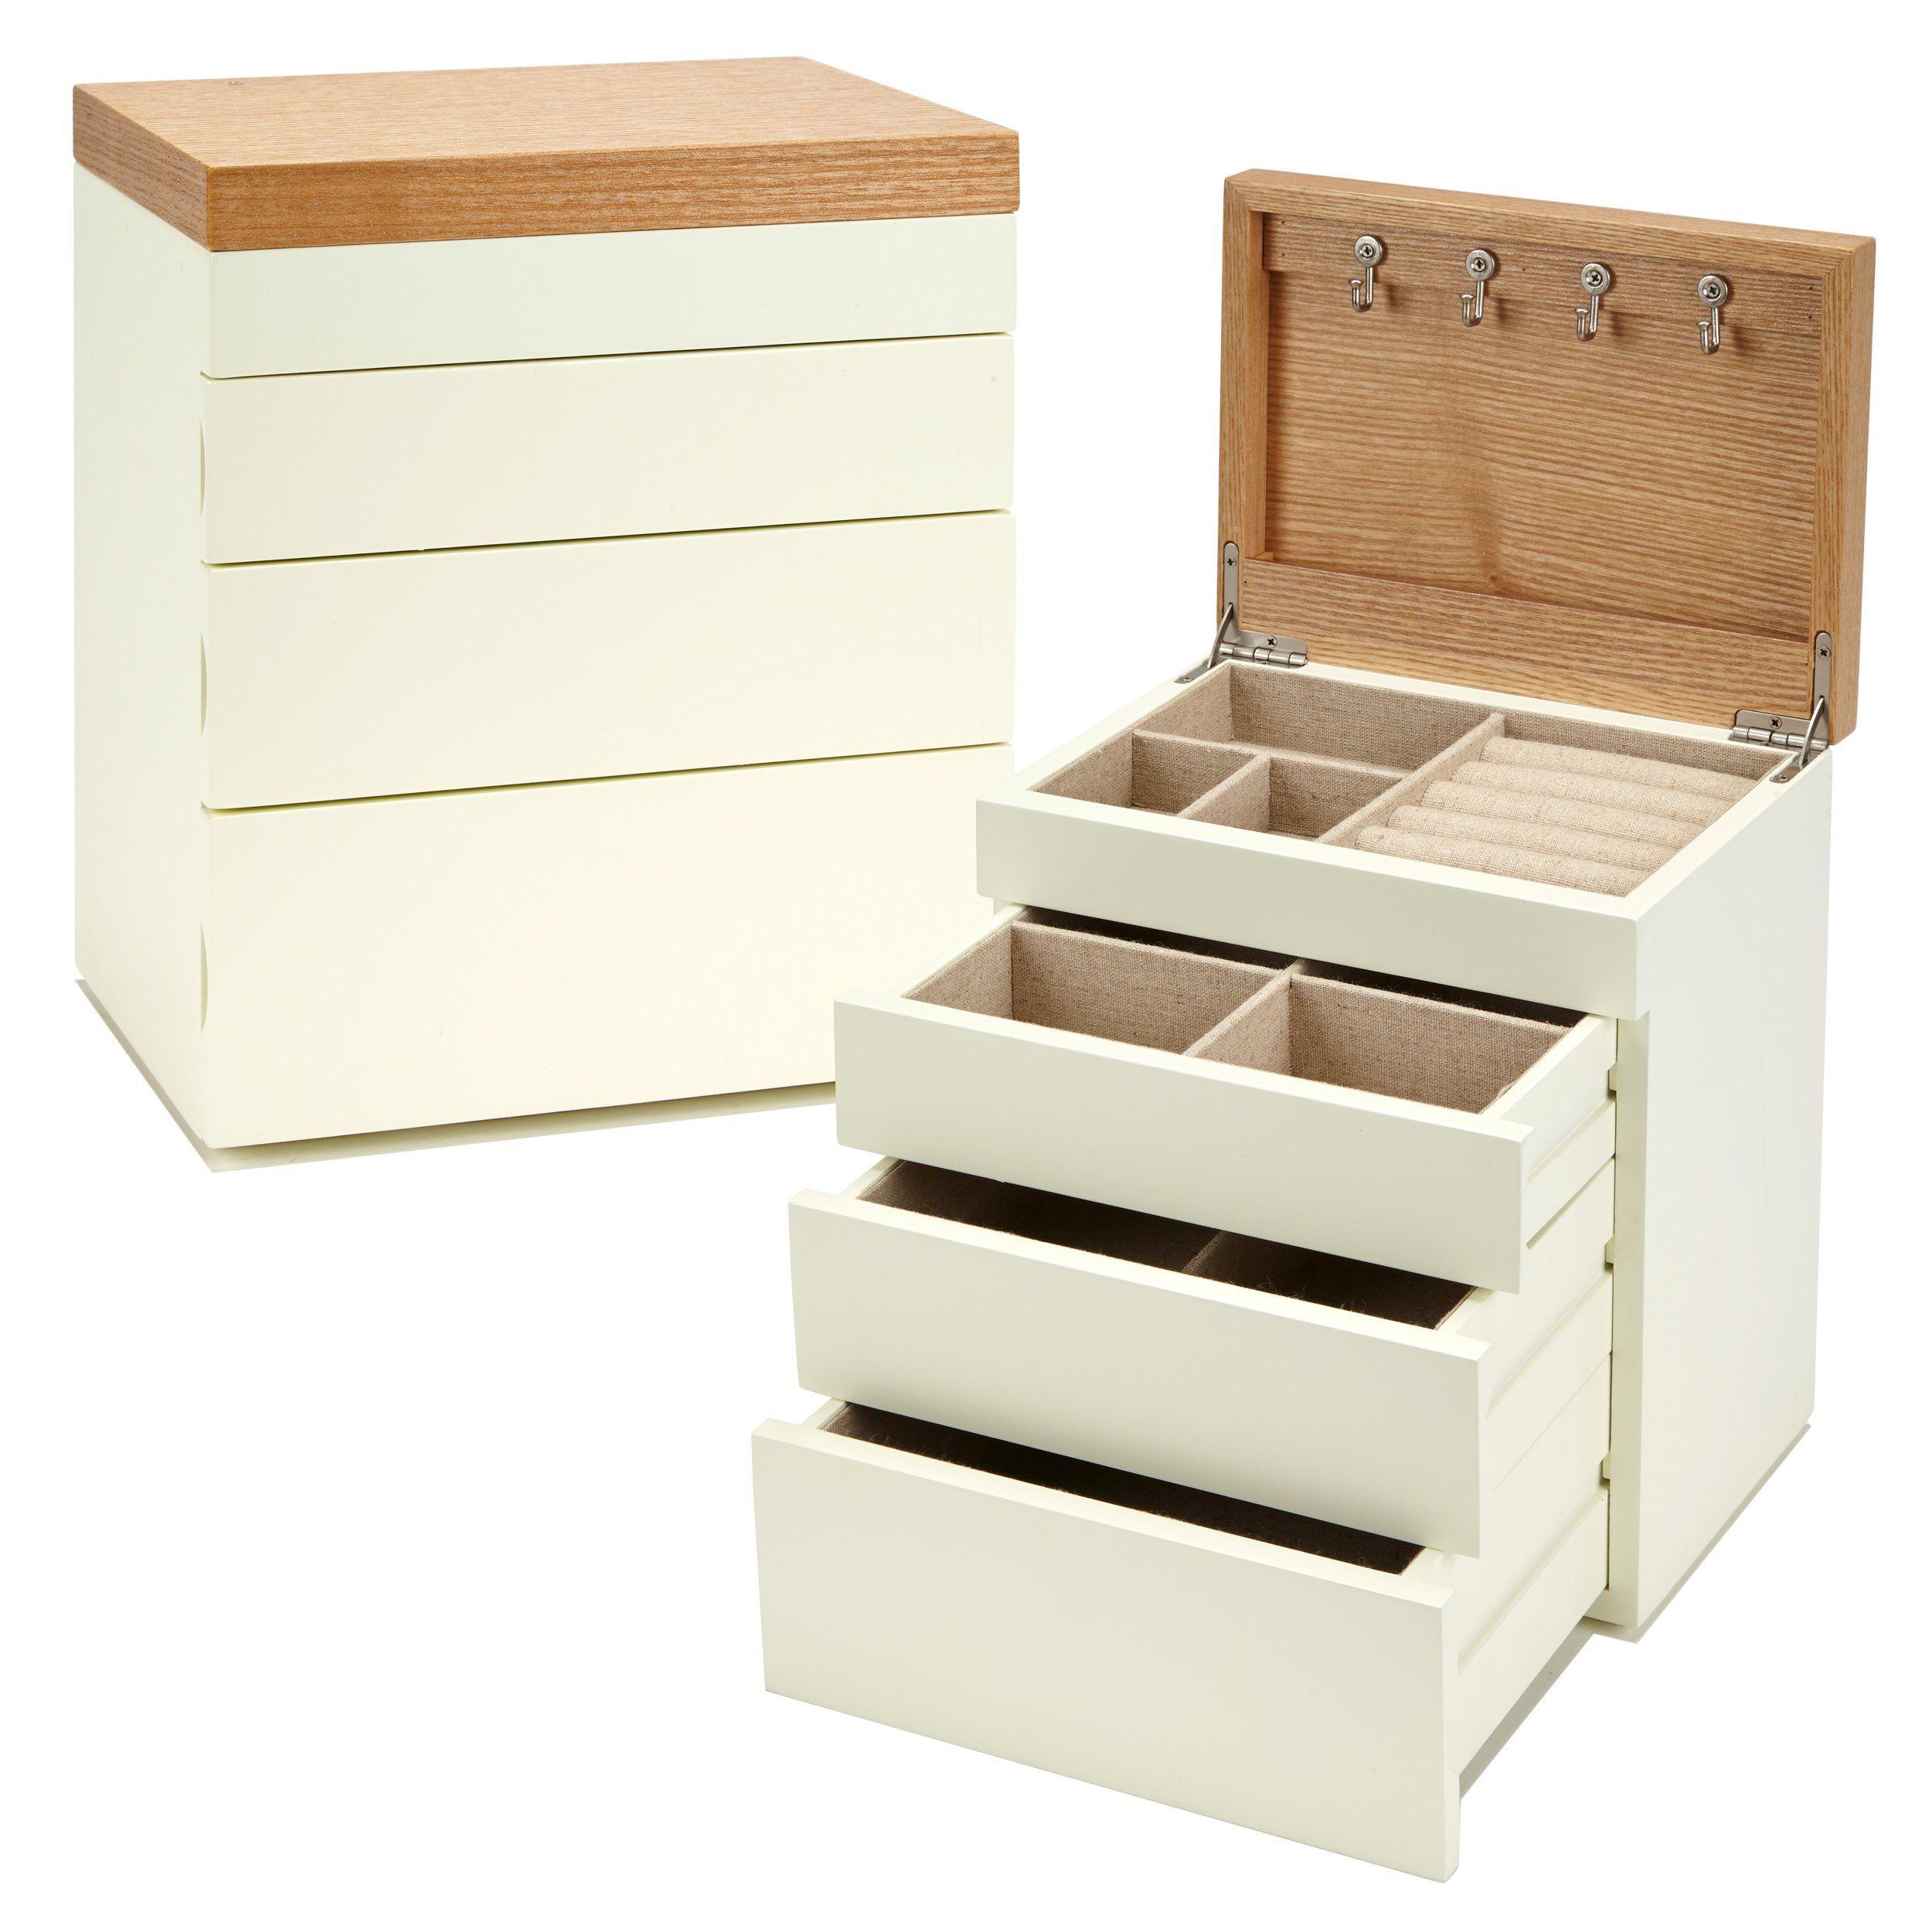 Seya TwoTone Modern Jewelry Box Organizer with Drawers Cream